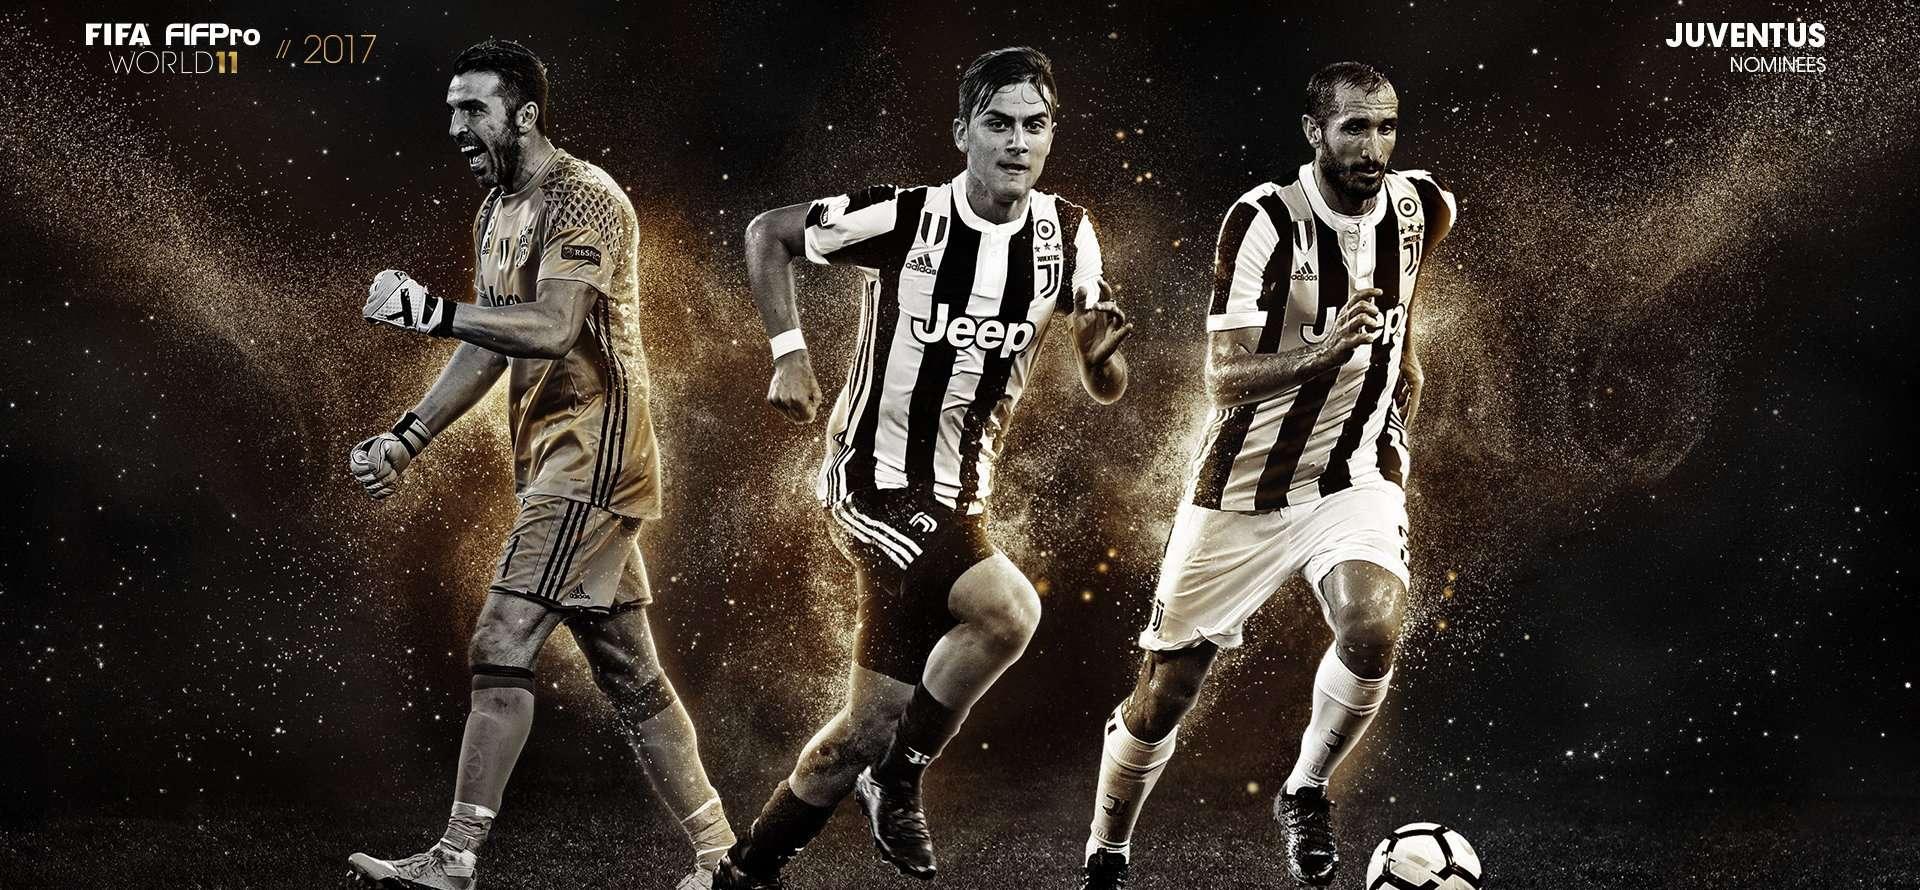 World 11 Fifpro, FIFA, AIC, top team, Bonucci, Chiellini, Buffon, Bonucci, Dybala